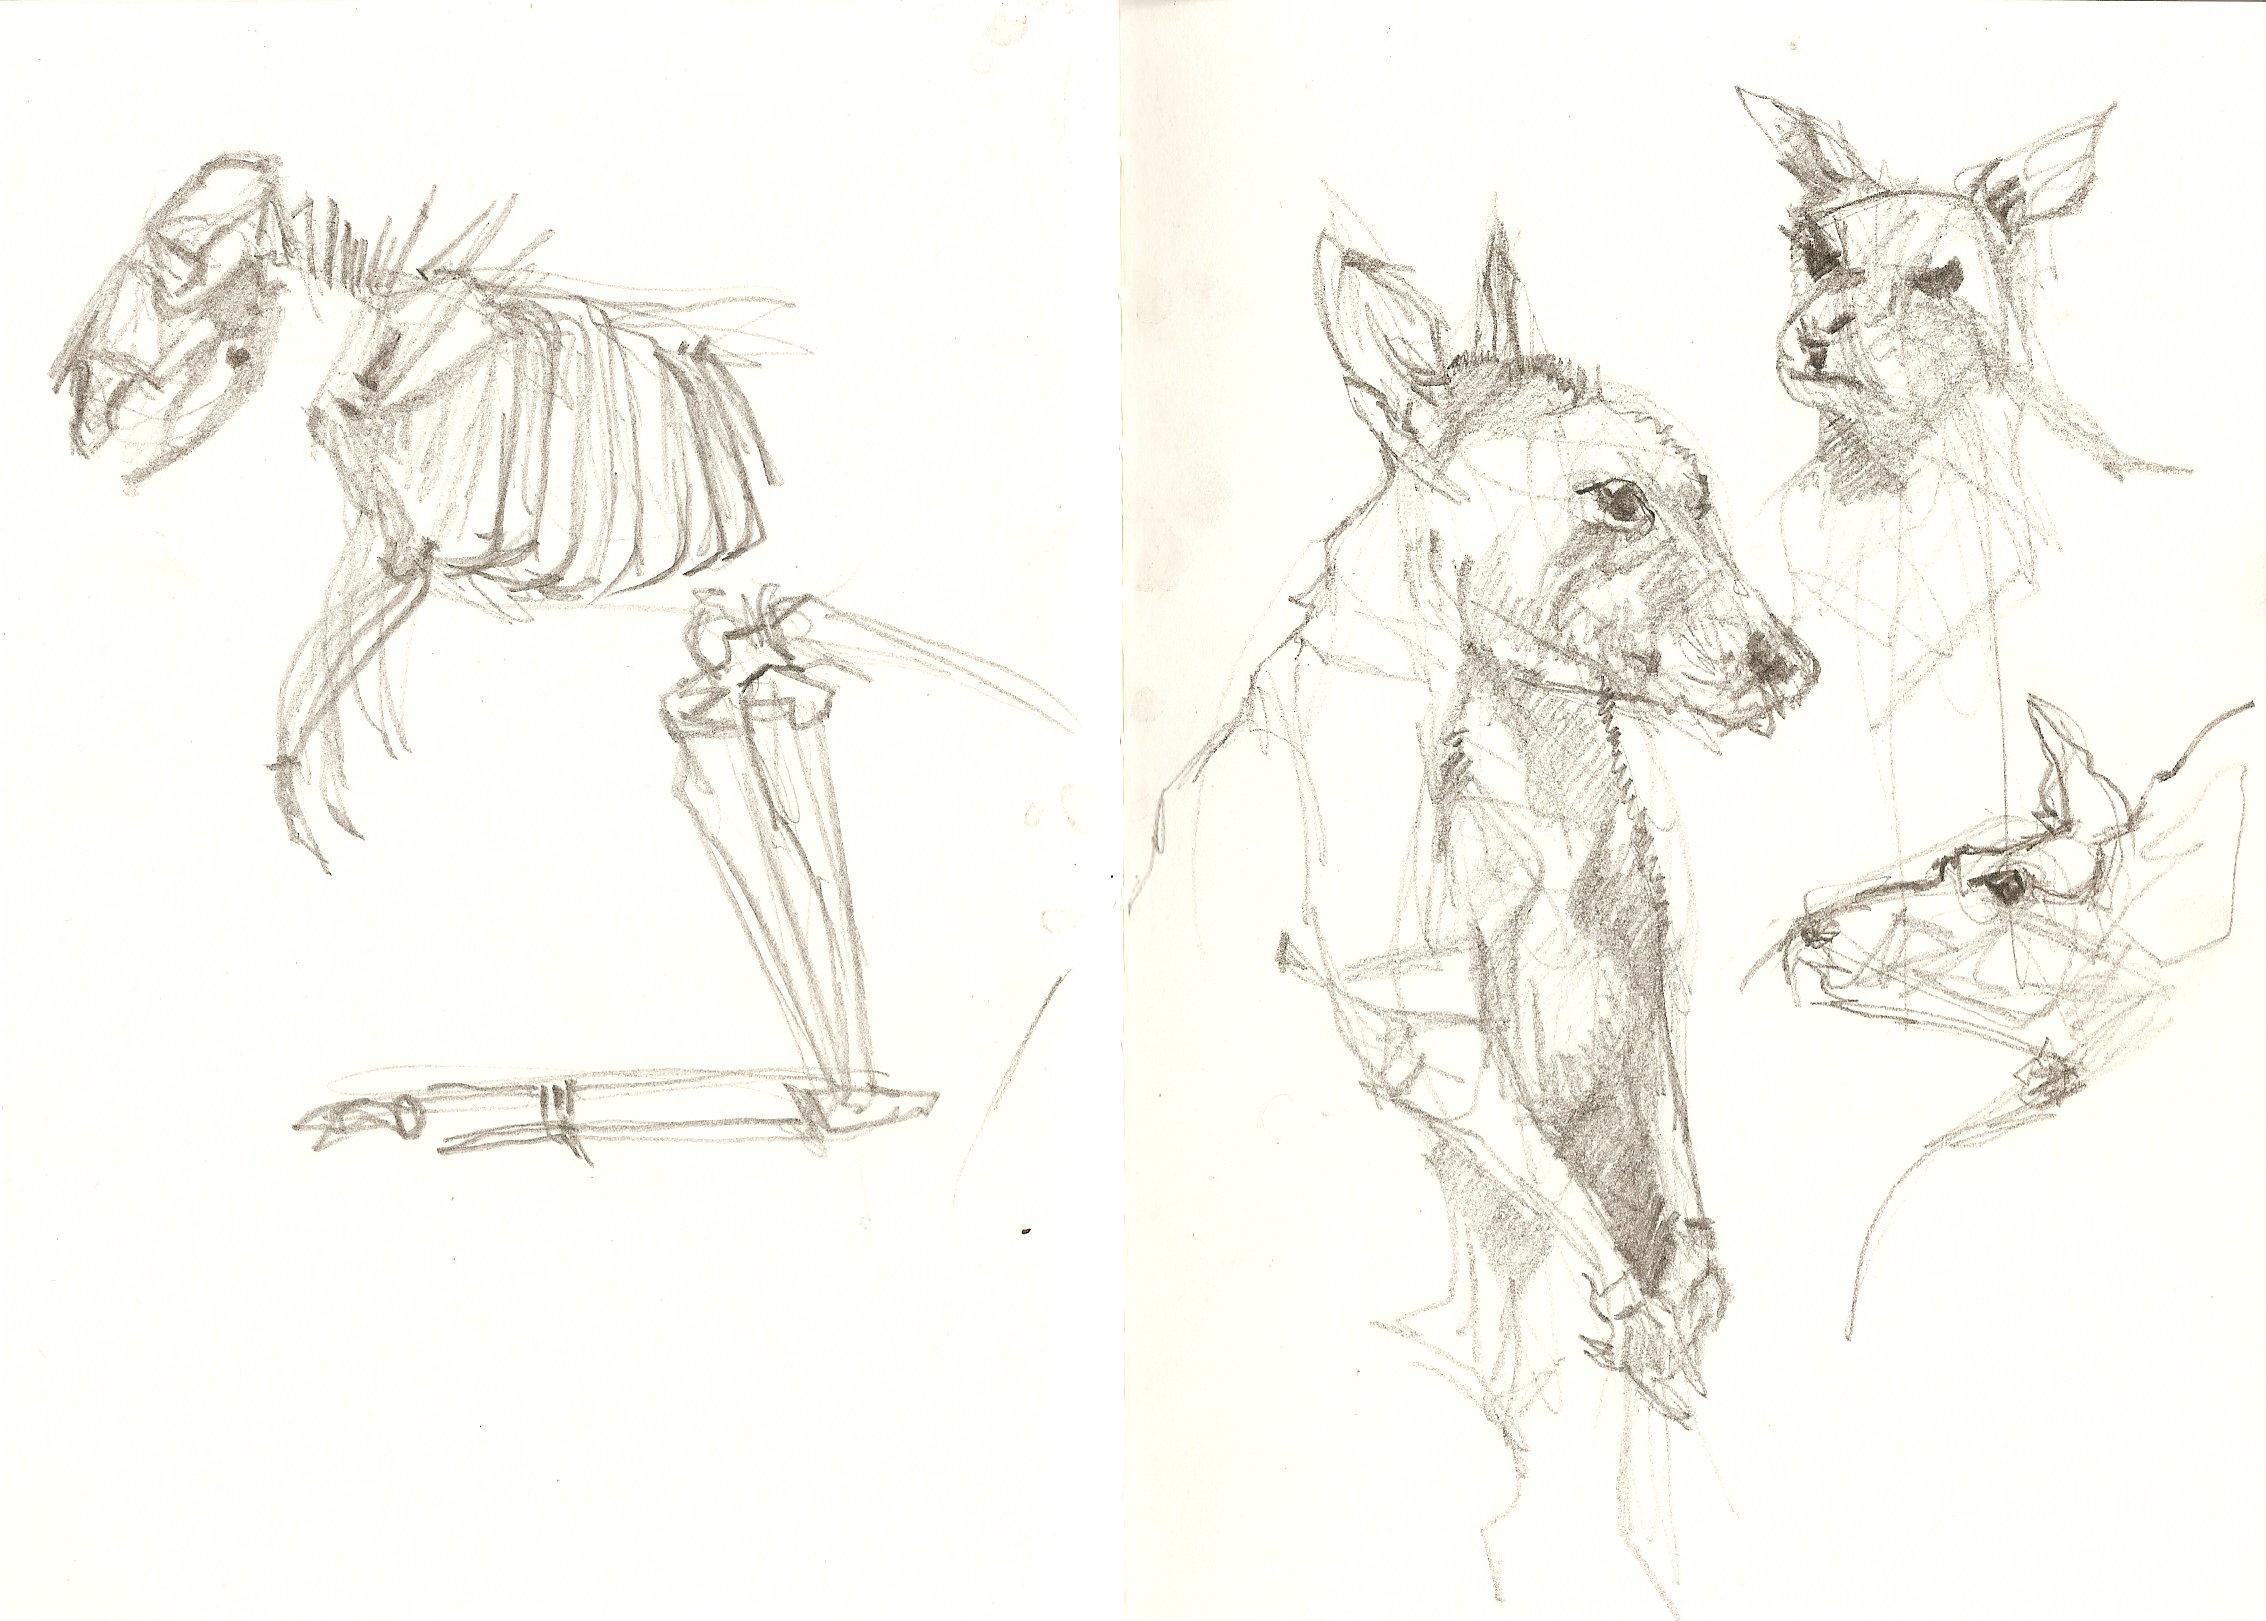 Kangaroo Sketch Drawing at GetDrawings.com | Free for personal use ...